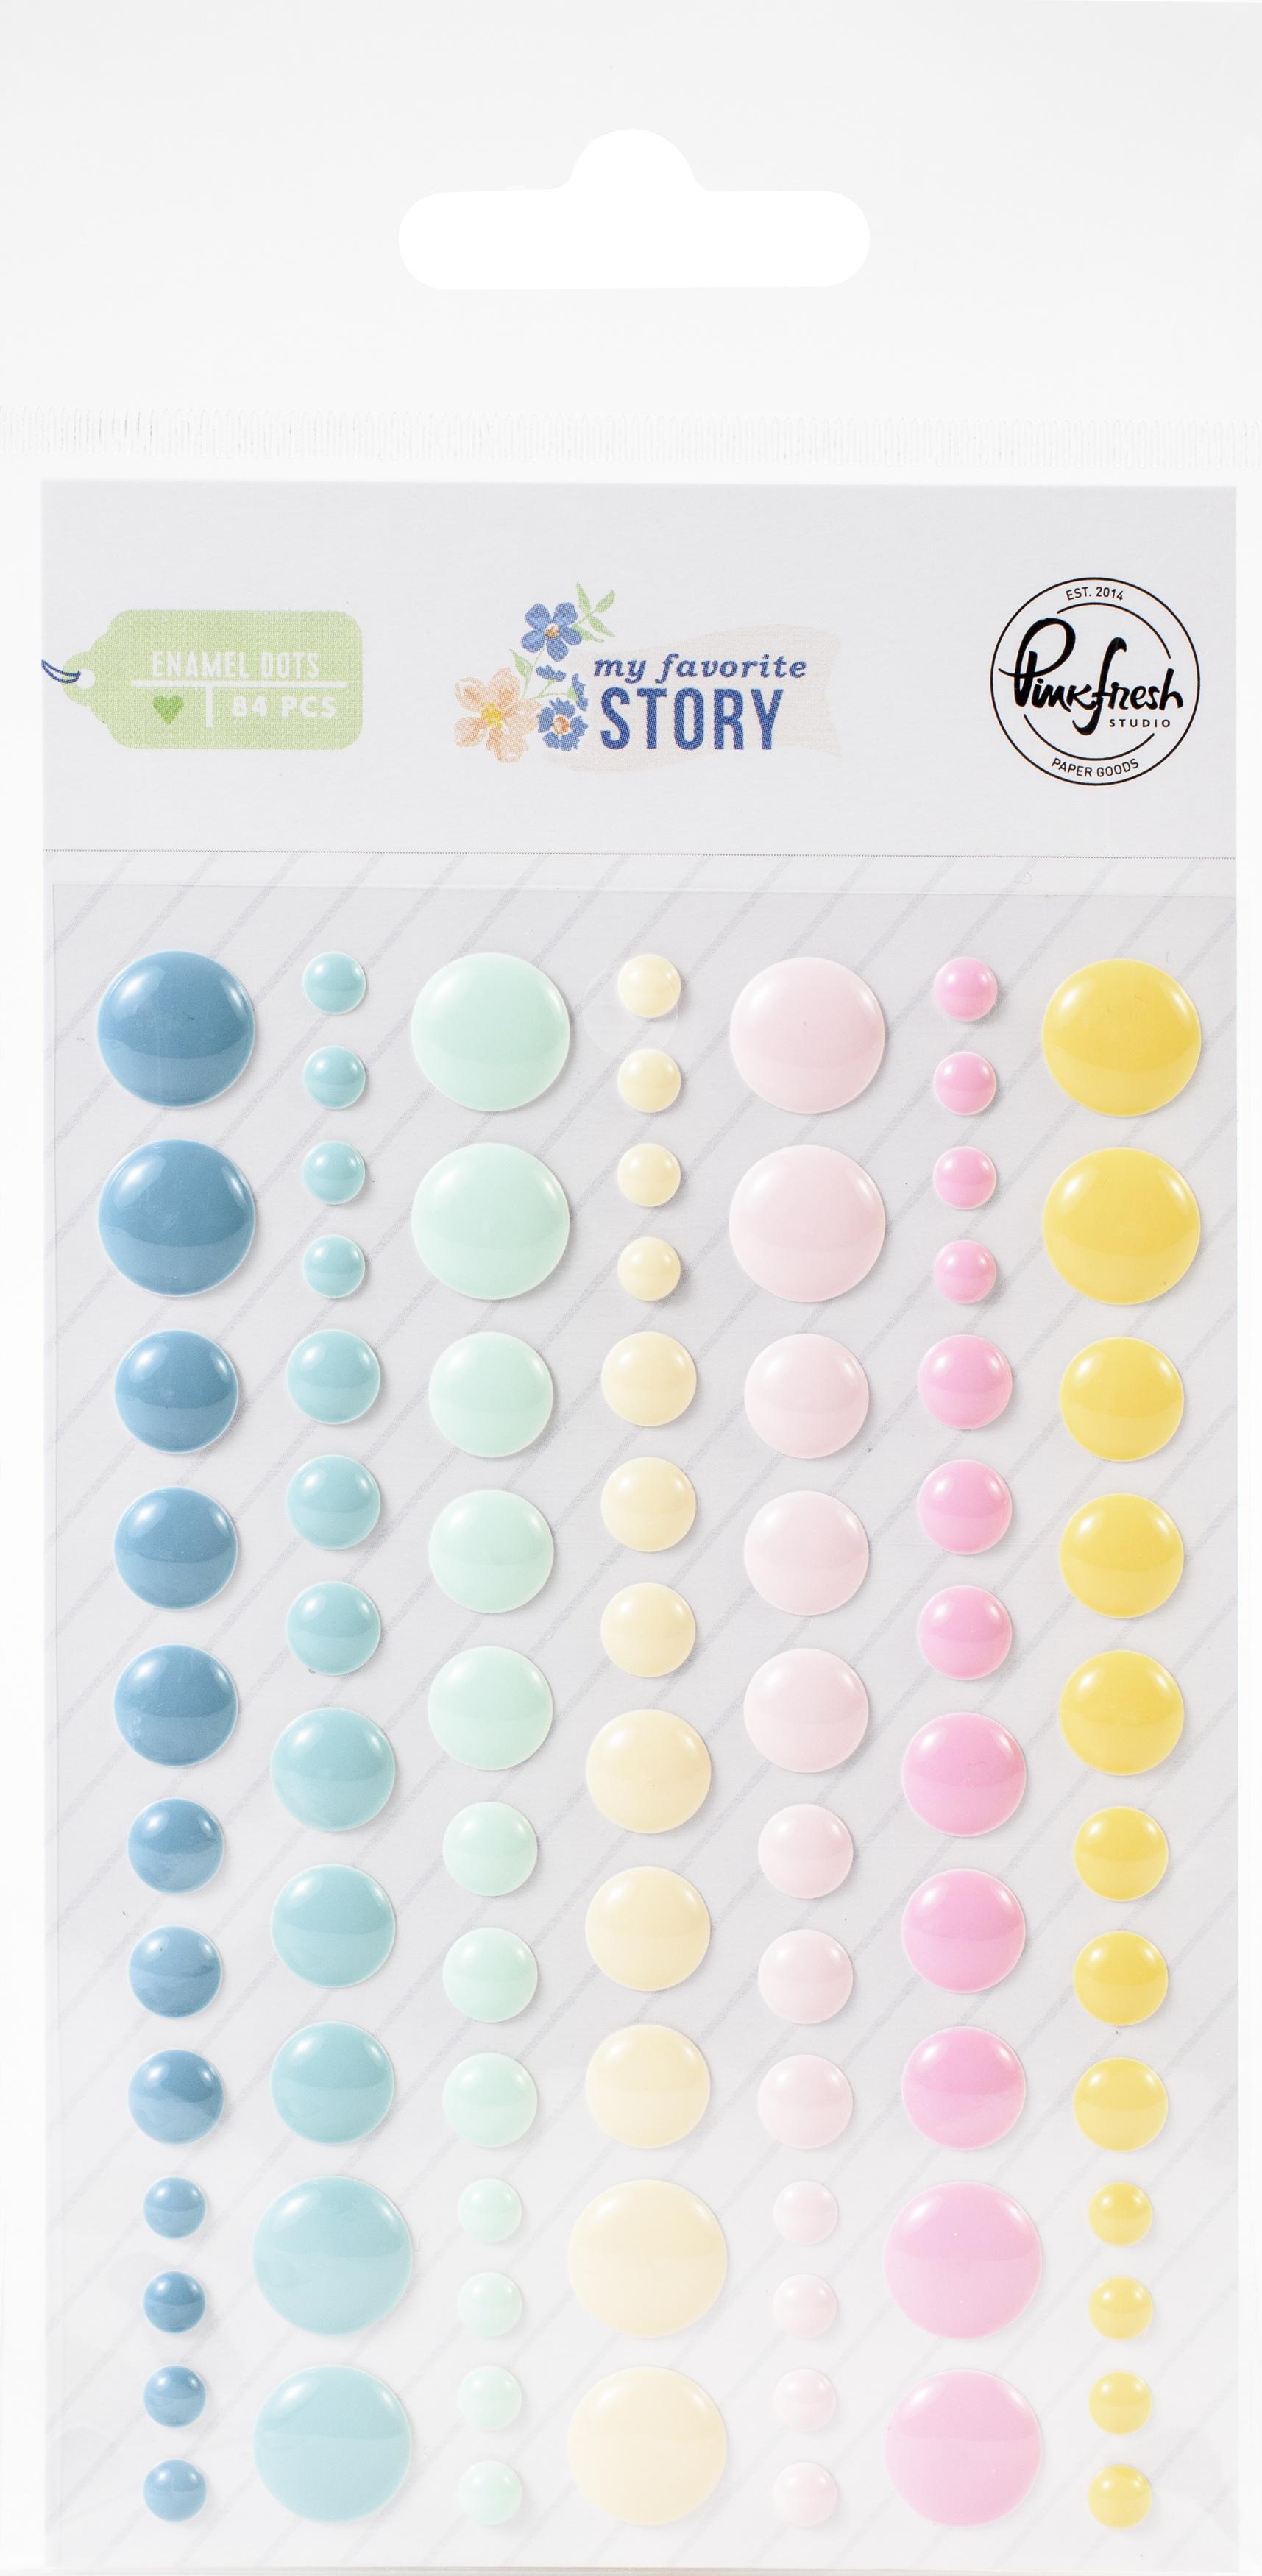 PinkFresh Enamel Dot Stickers-My Favorite Story